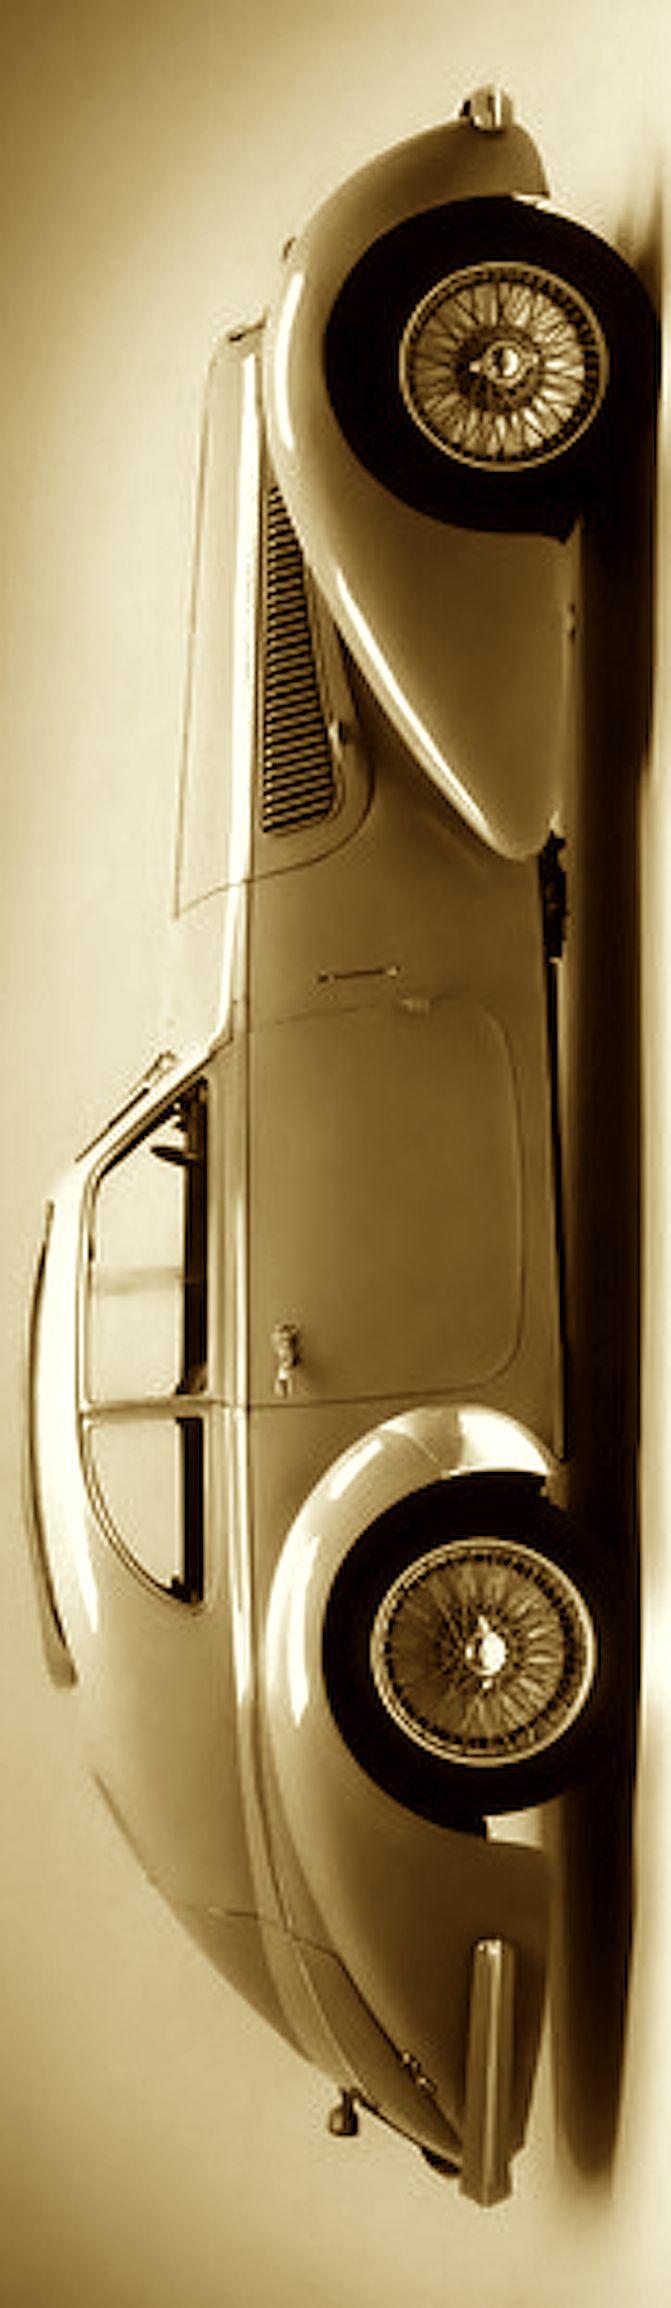 Alfa Romeo 8C 2900B - 1938 ✏✏✏✏✏✏✏✏✏✏✏✏✏✏✏✏ IDEE CADEAU / CUTE GIFT IDEA ☞ http://gabyfeeriefr.tumblr.com/archive ✏✏✏✏✏✏✏✏✏✏✏✏✏✏✏✏